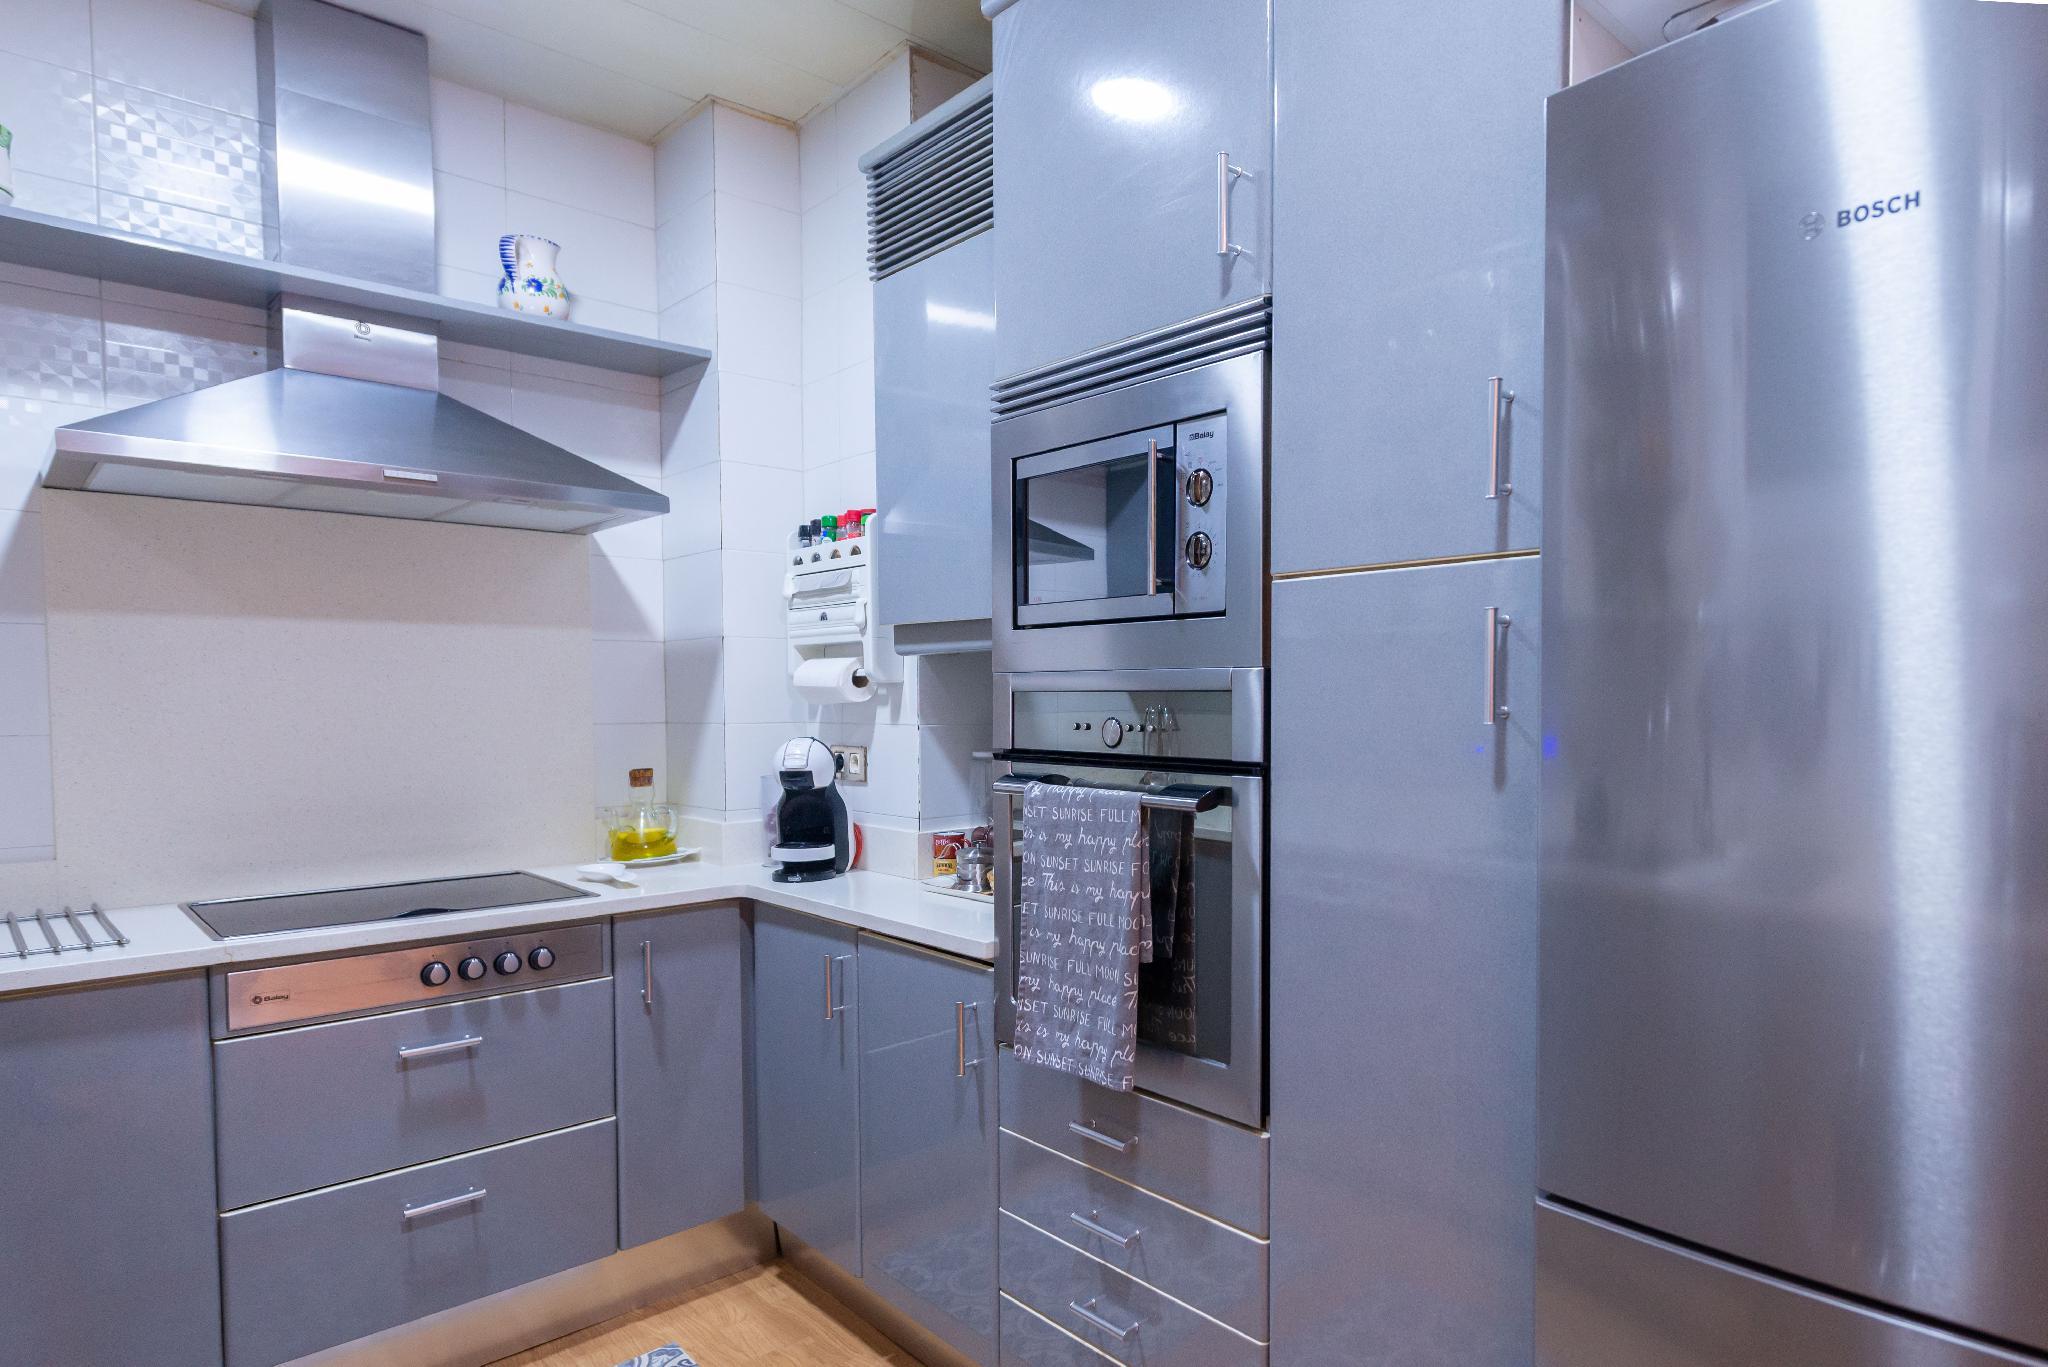 166582 Flat for sale in Eixample, Dreta Eixample 9